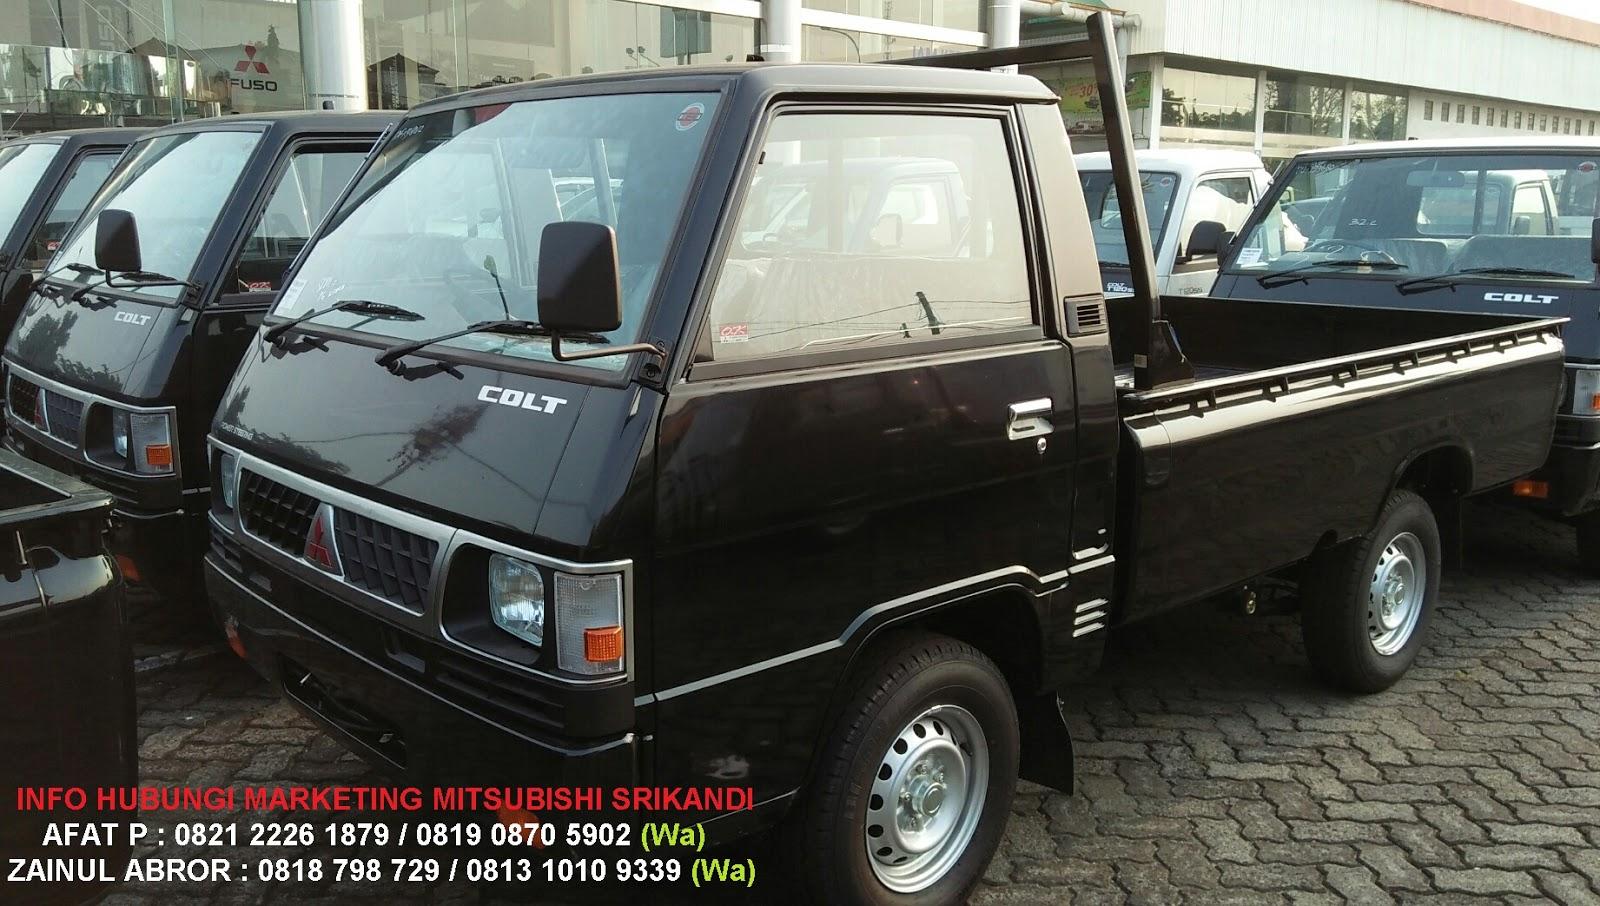 Dealer Mitsubishi Niaga Dki Jakarta : HARGA COLT L300